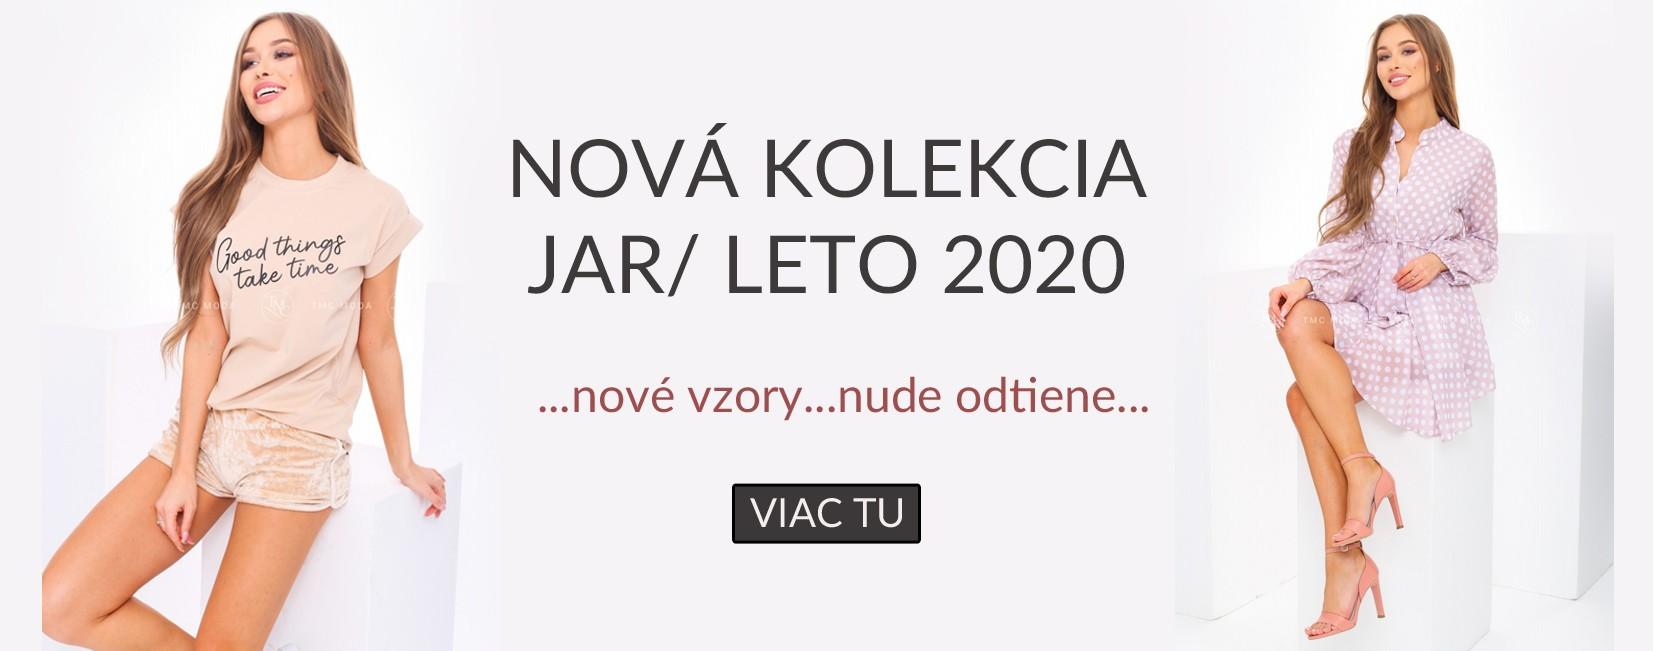 Nová kolekcia JAR/LETO 2020